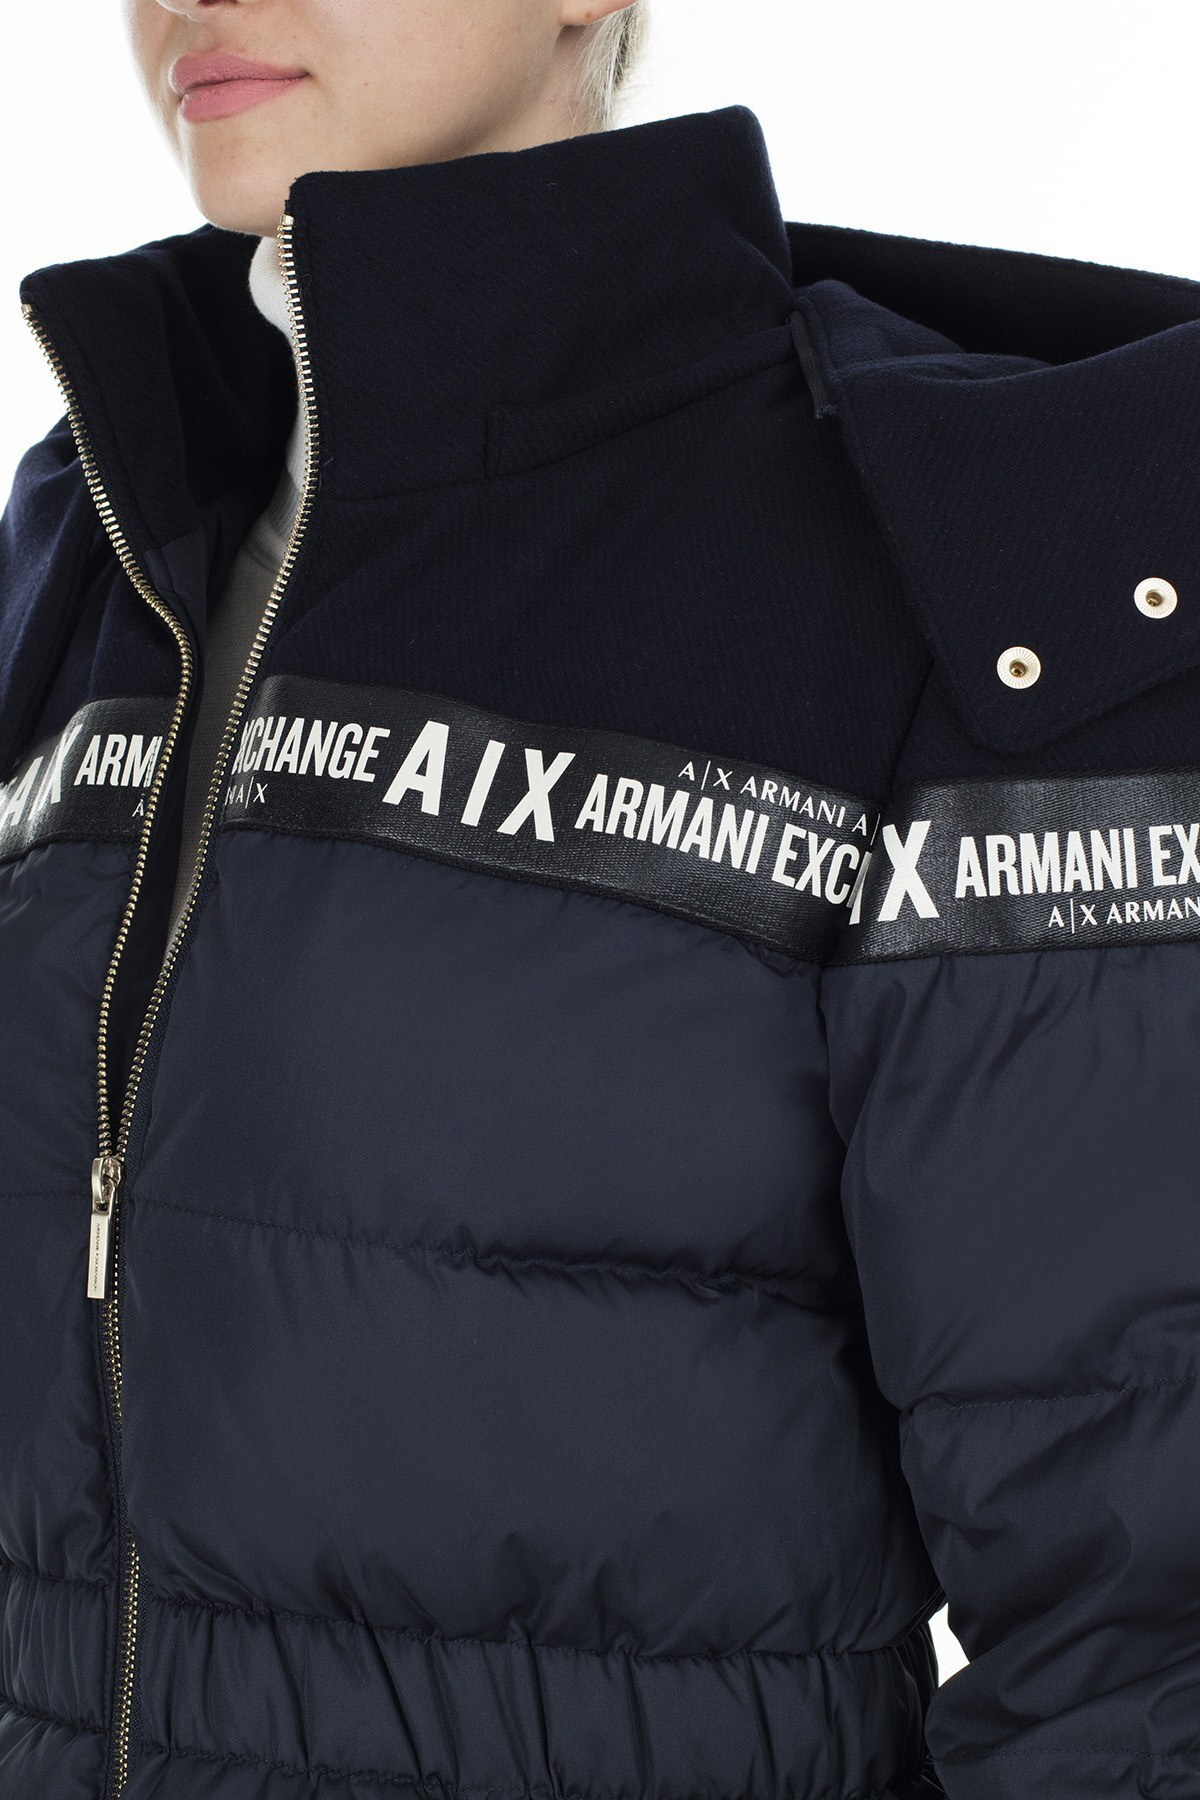 Armani Exchange Kadın Mont 6GYB09 YNNAZ 1593